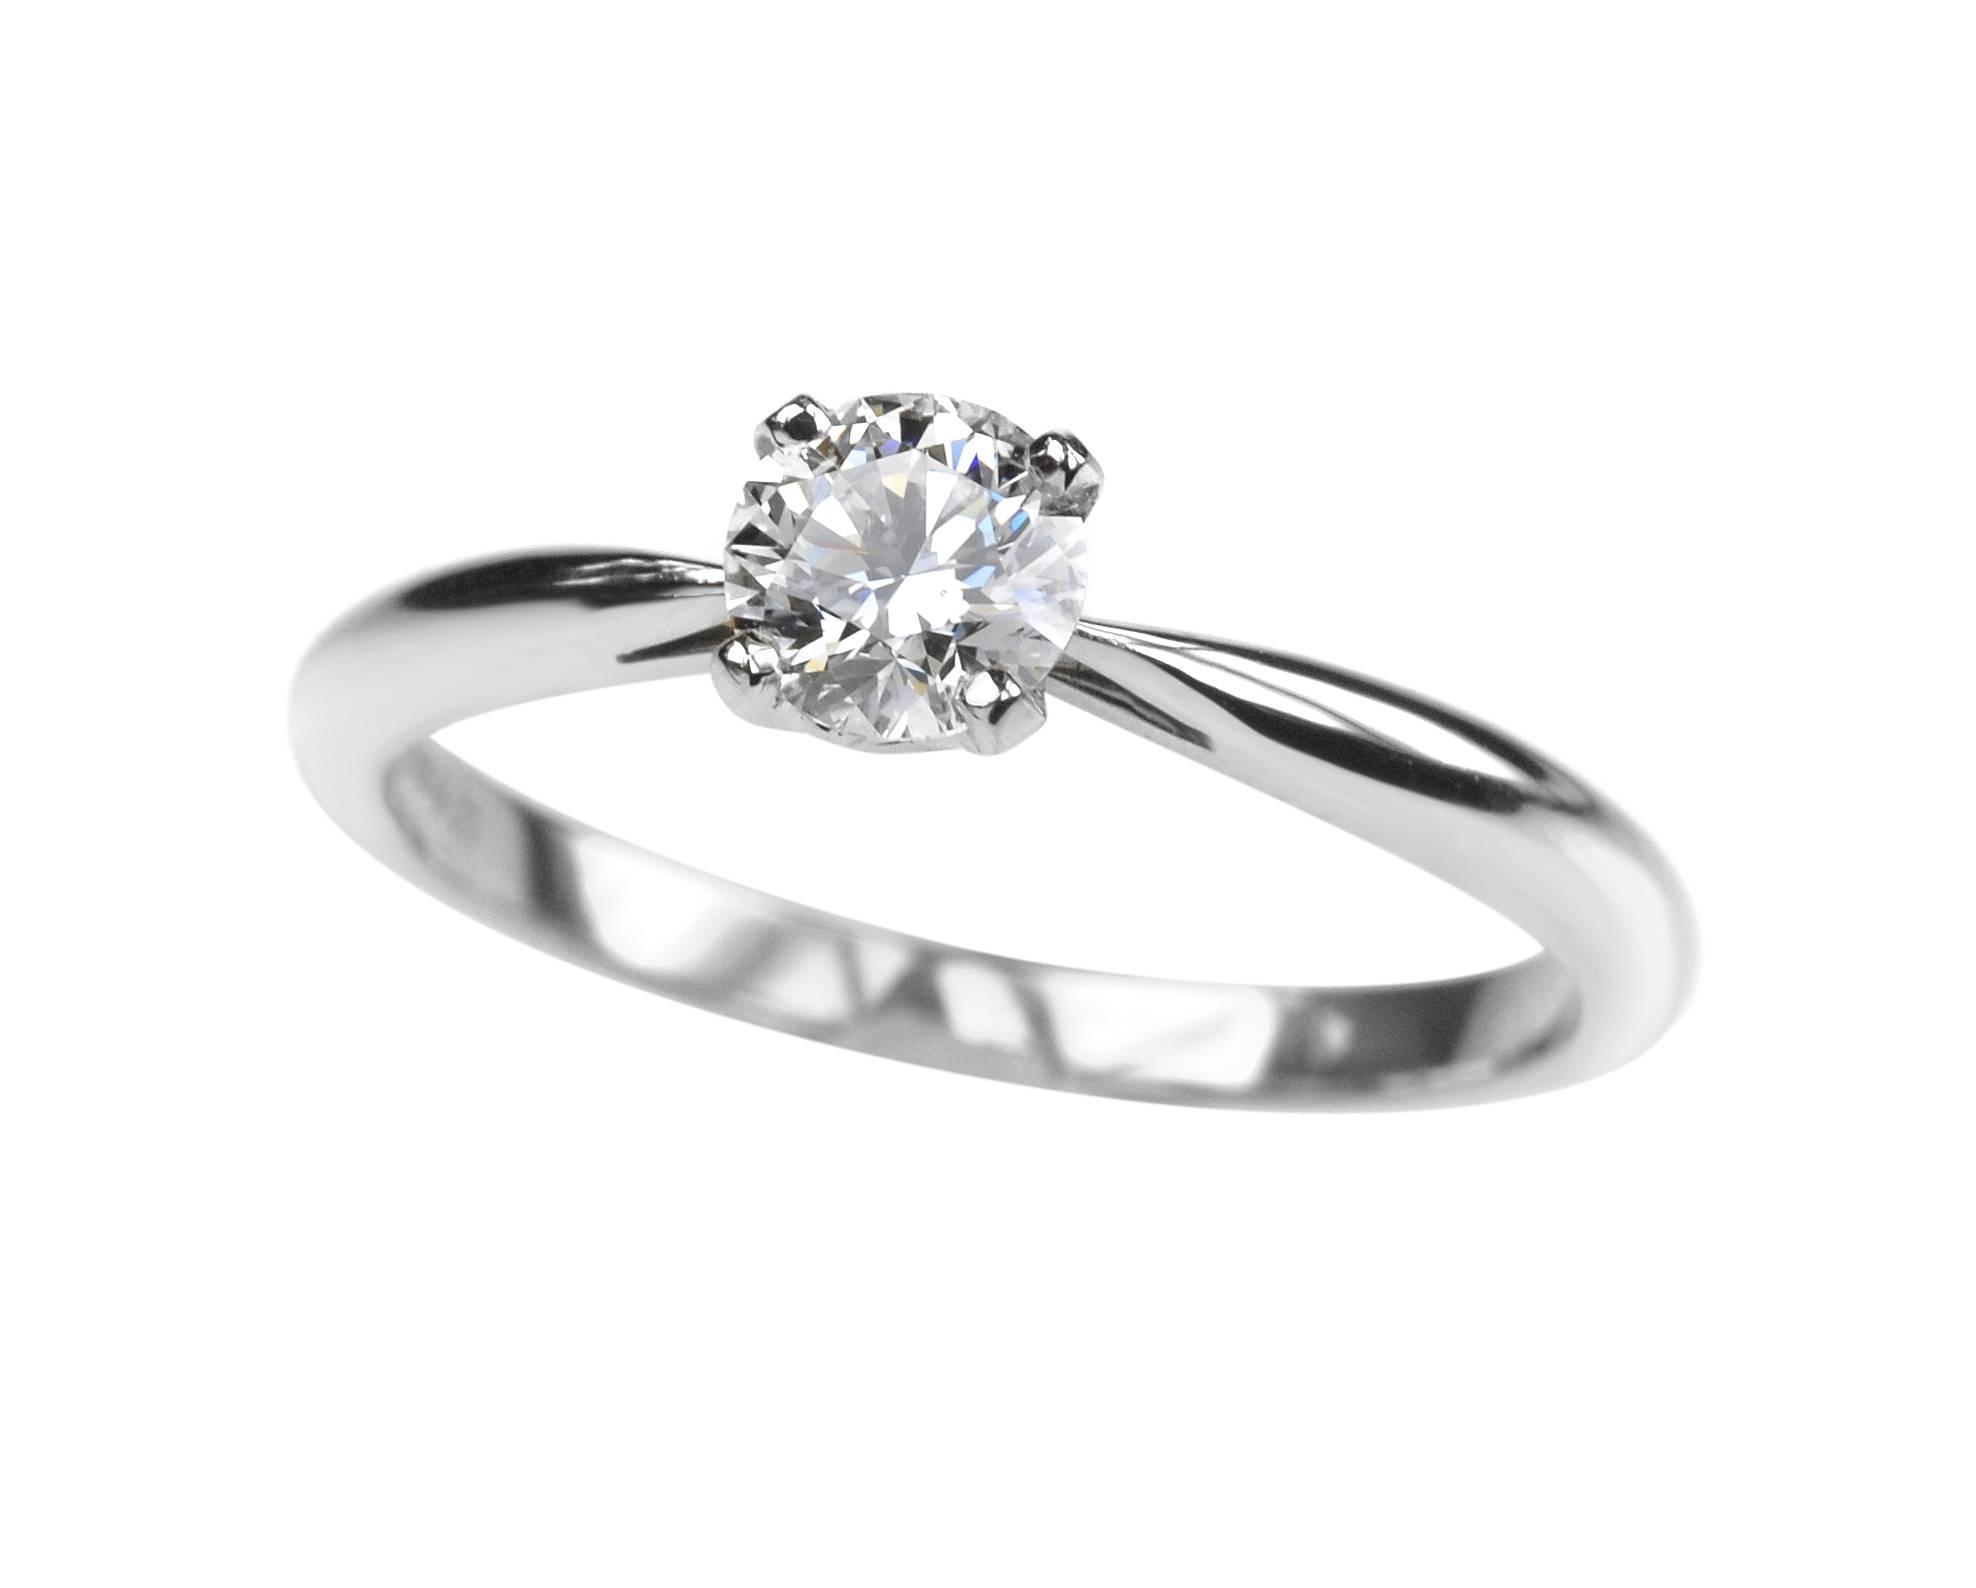 Diamond Engagement Rings London, Platinum Engagement Rings Pertaining To Diamond And Platinum Wedding Rings (View 9 of 15)